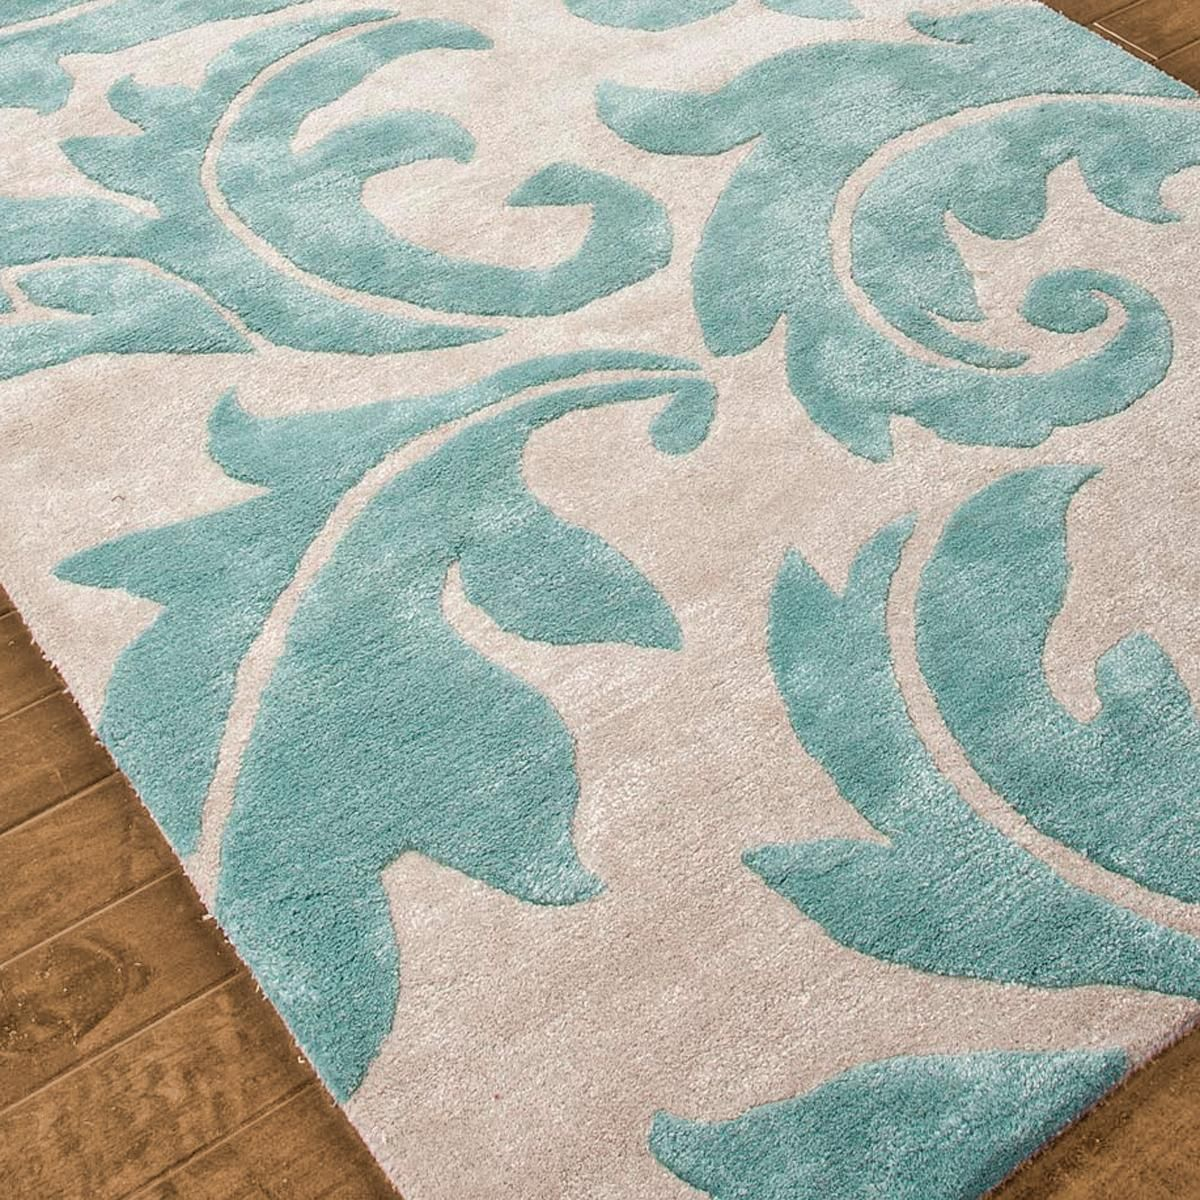 Modern Renaissance Scrolling Leaves Plush Rug: 4 Colors